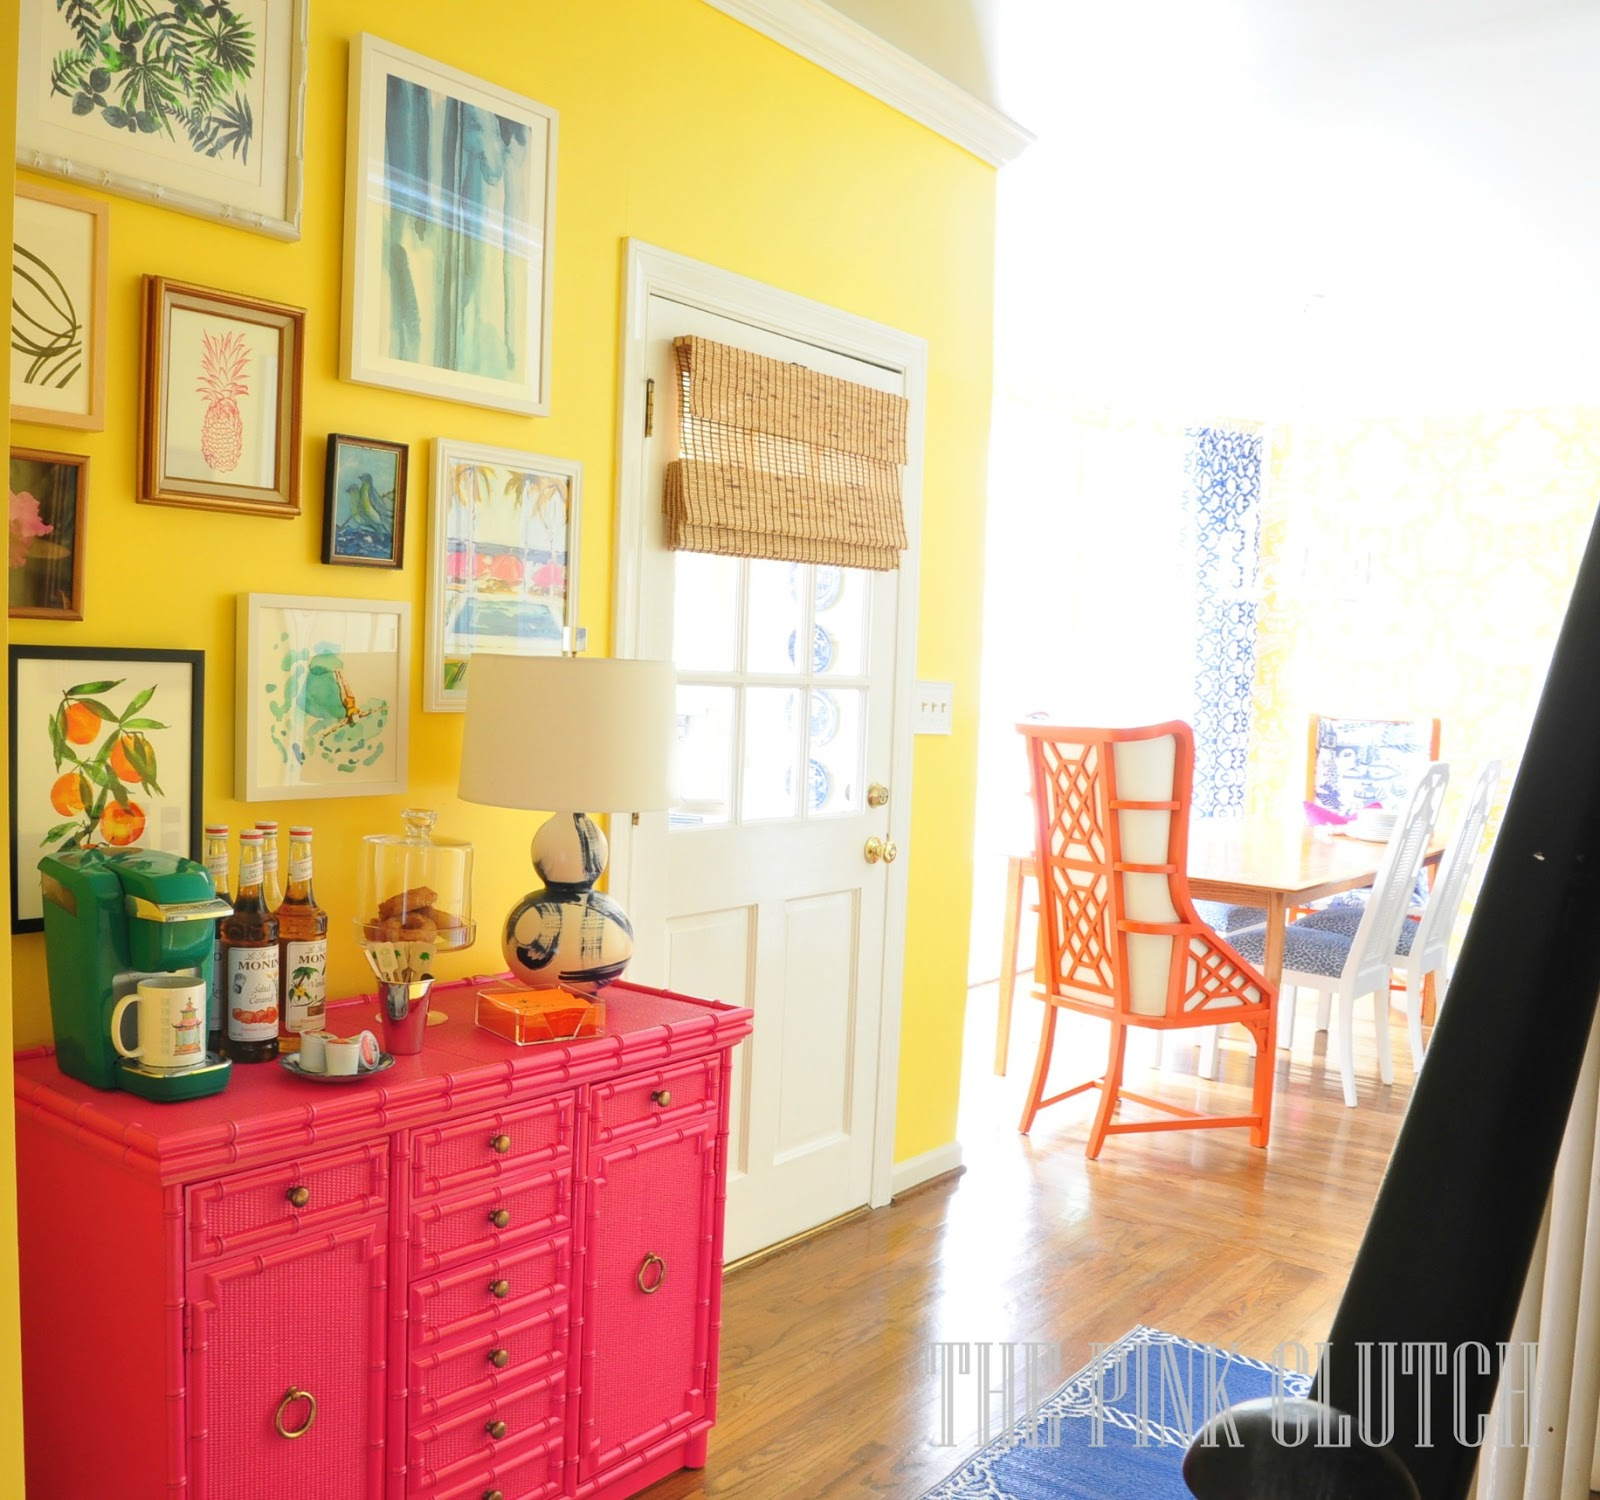 One Room Kitchen Interior Design In Mumbai: The Pink Clutch ...: One Room Challenge ... Kitchen Reveal